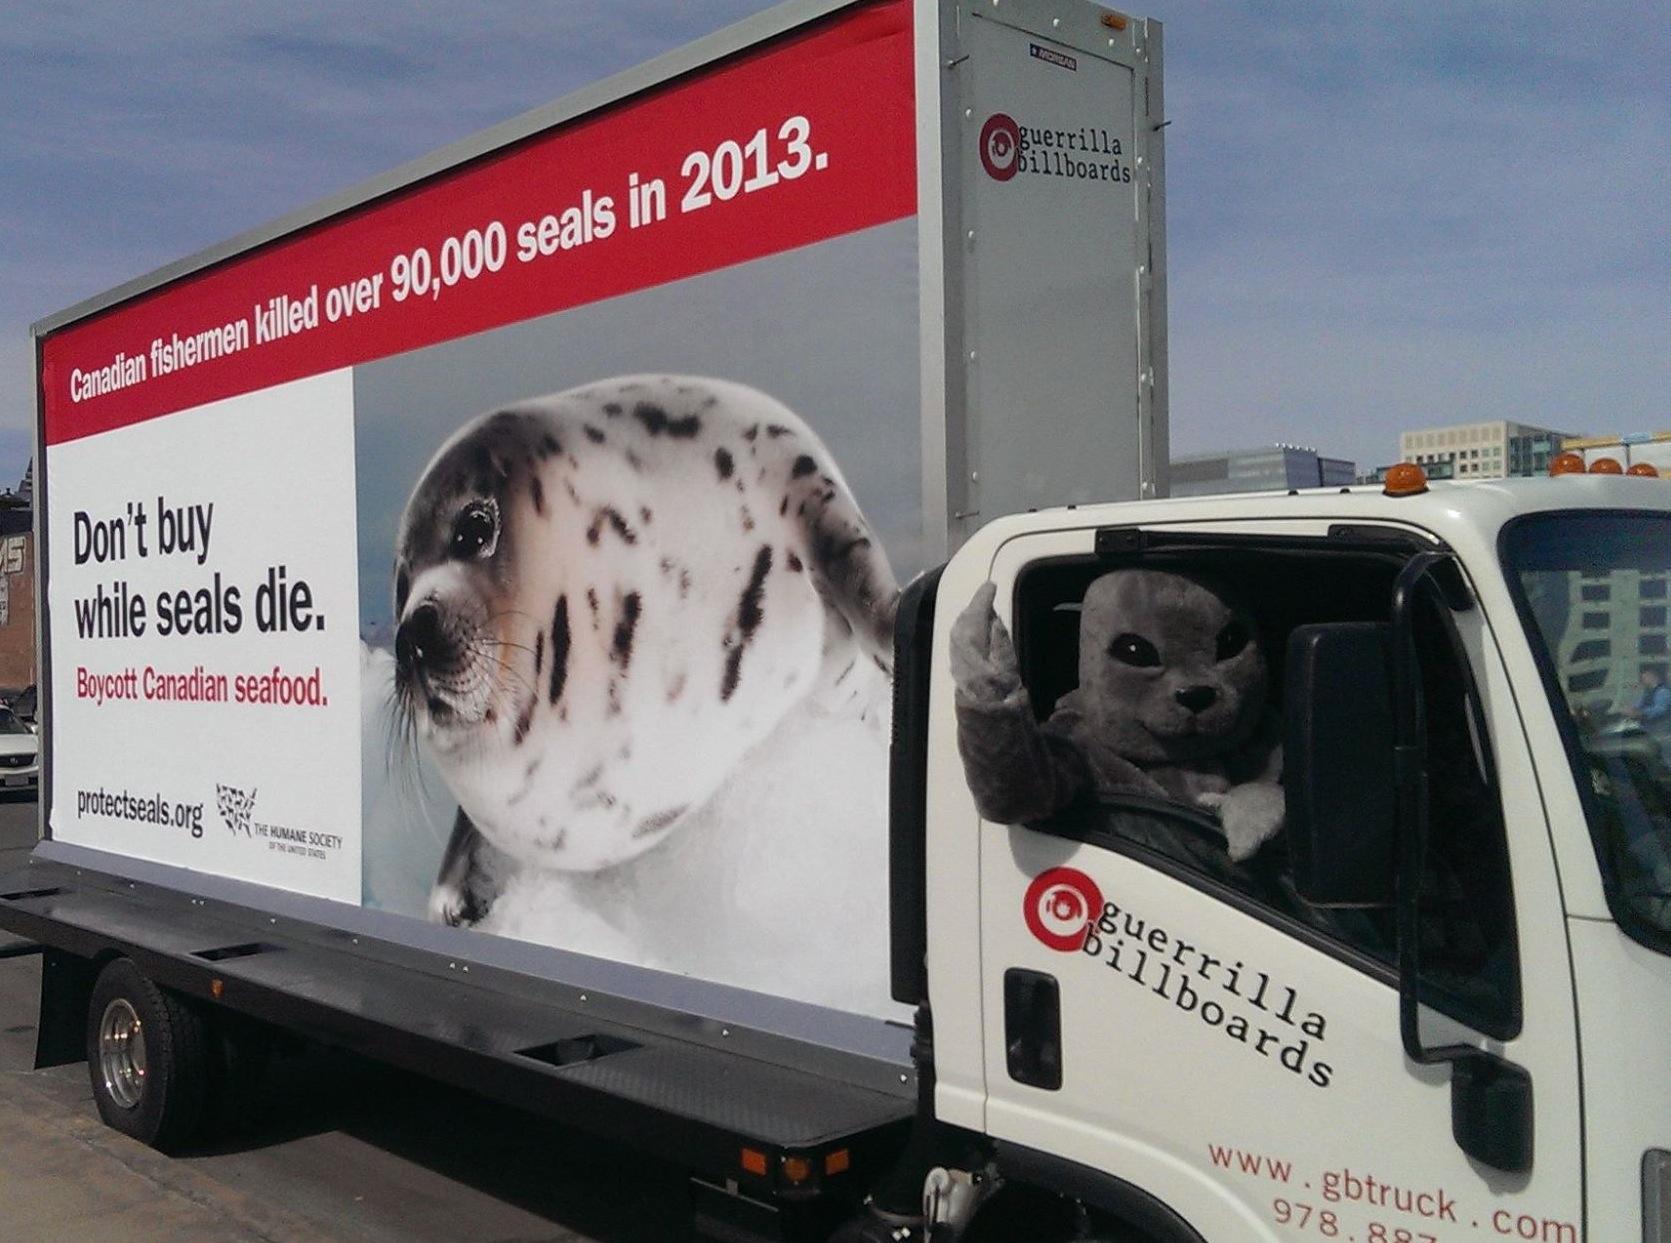 U.S. Humane Society truck calls for Canadian seafood boycott